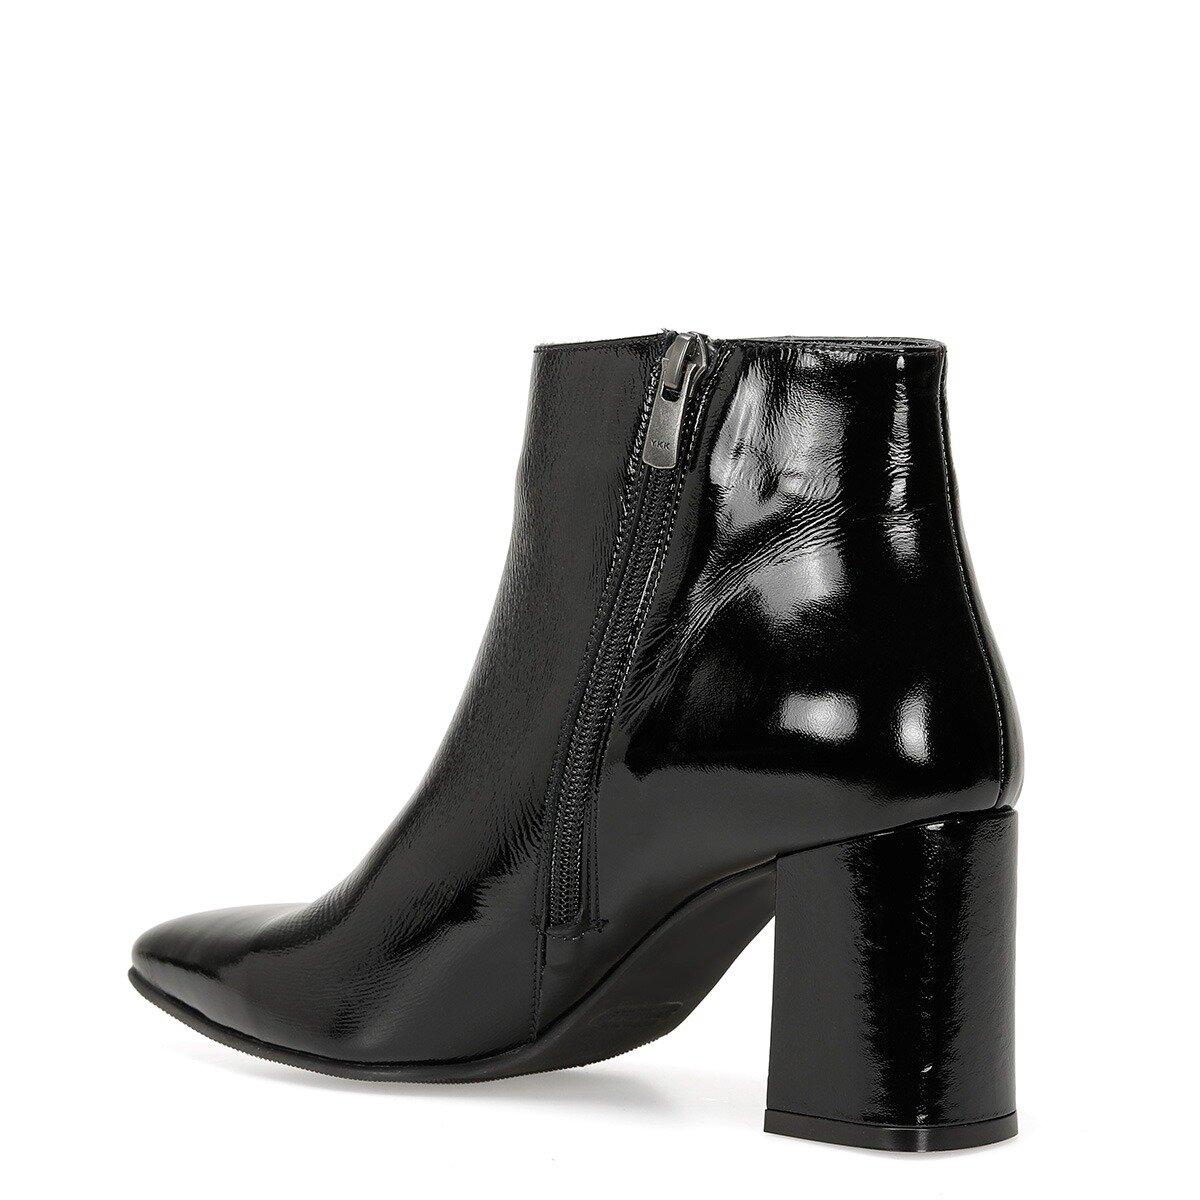 GALO3 Siyah Kadın Topuklu Ayakkabı